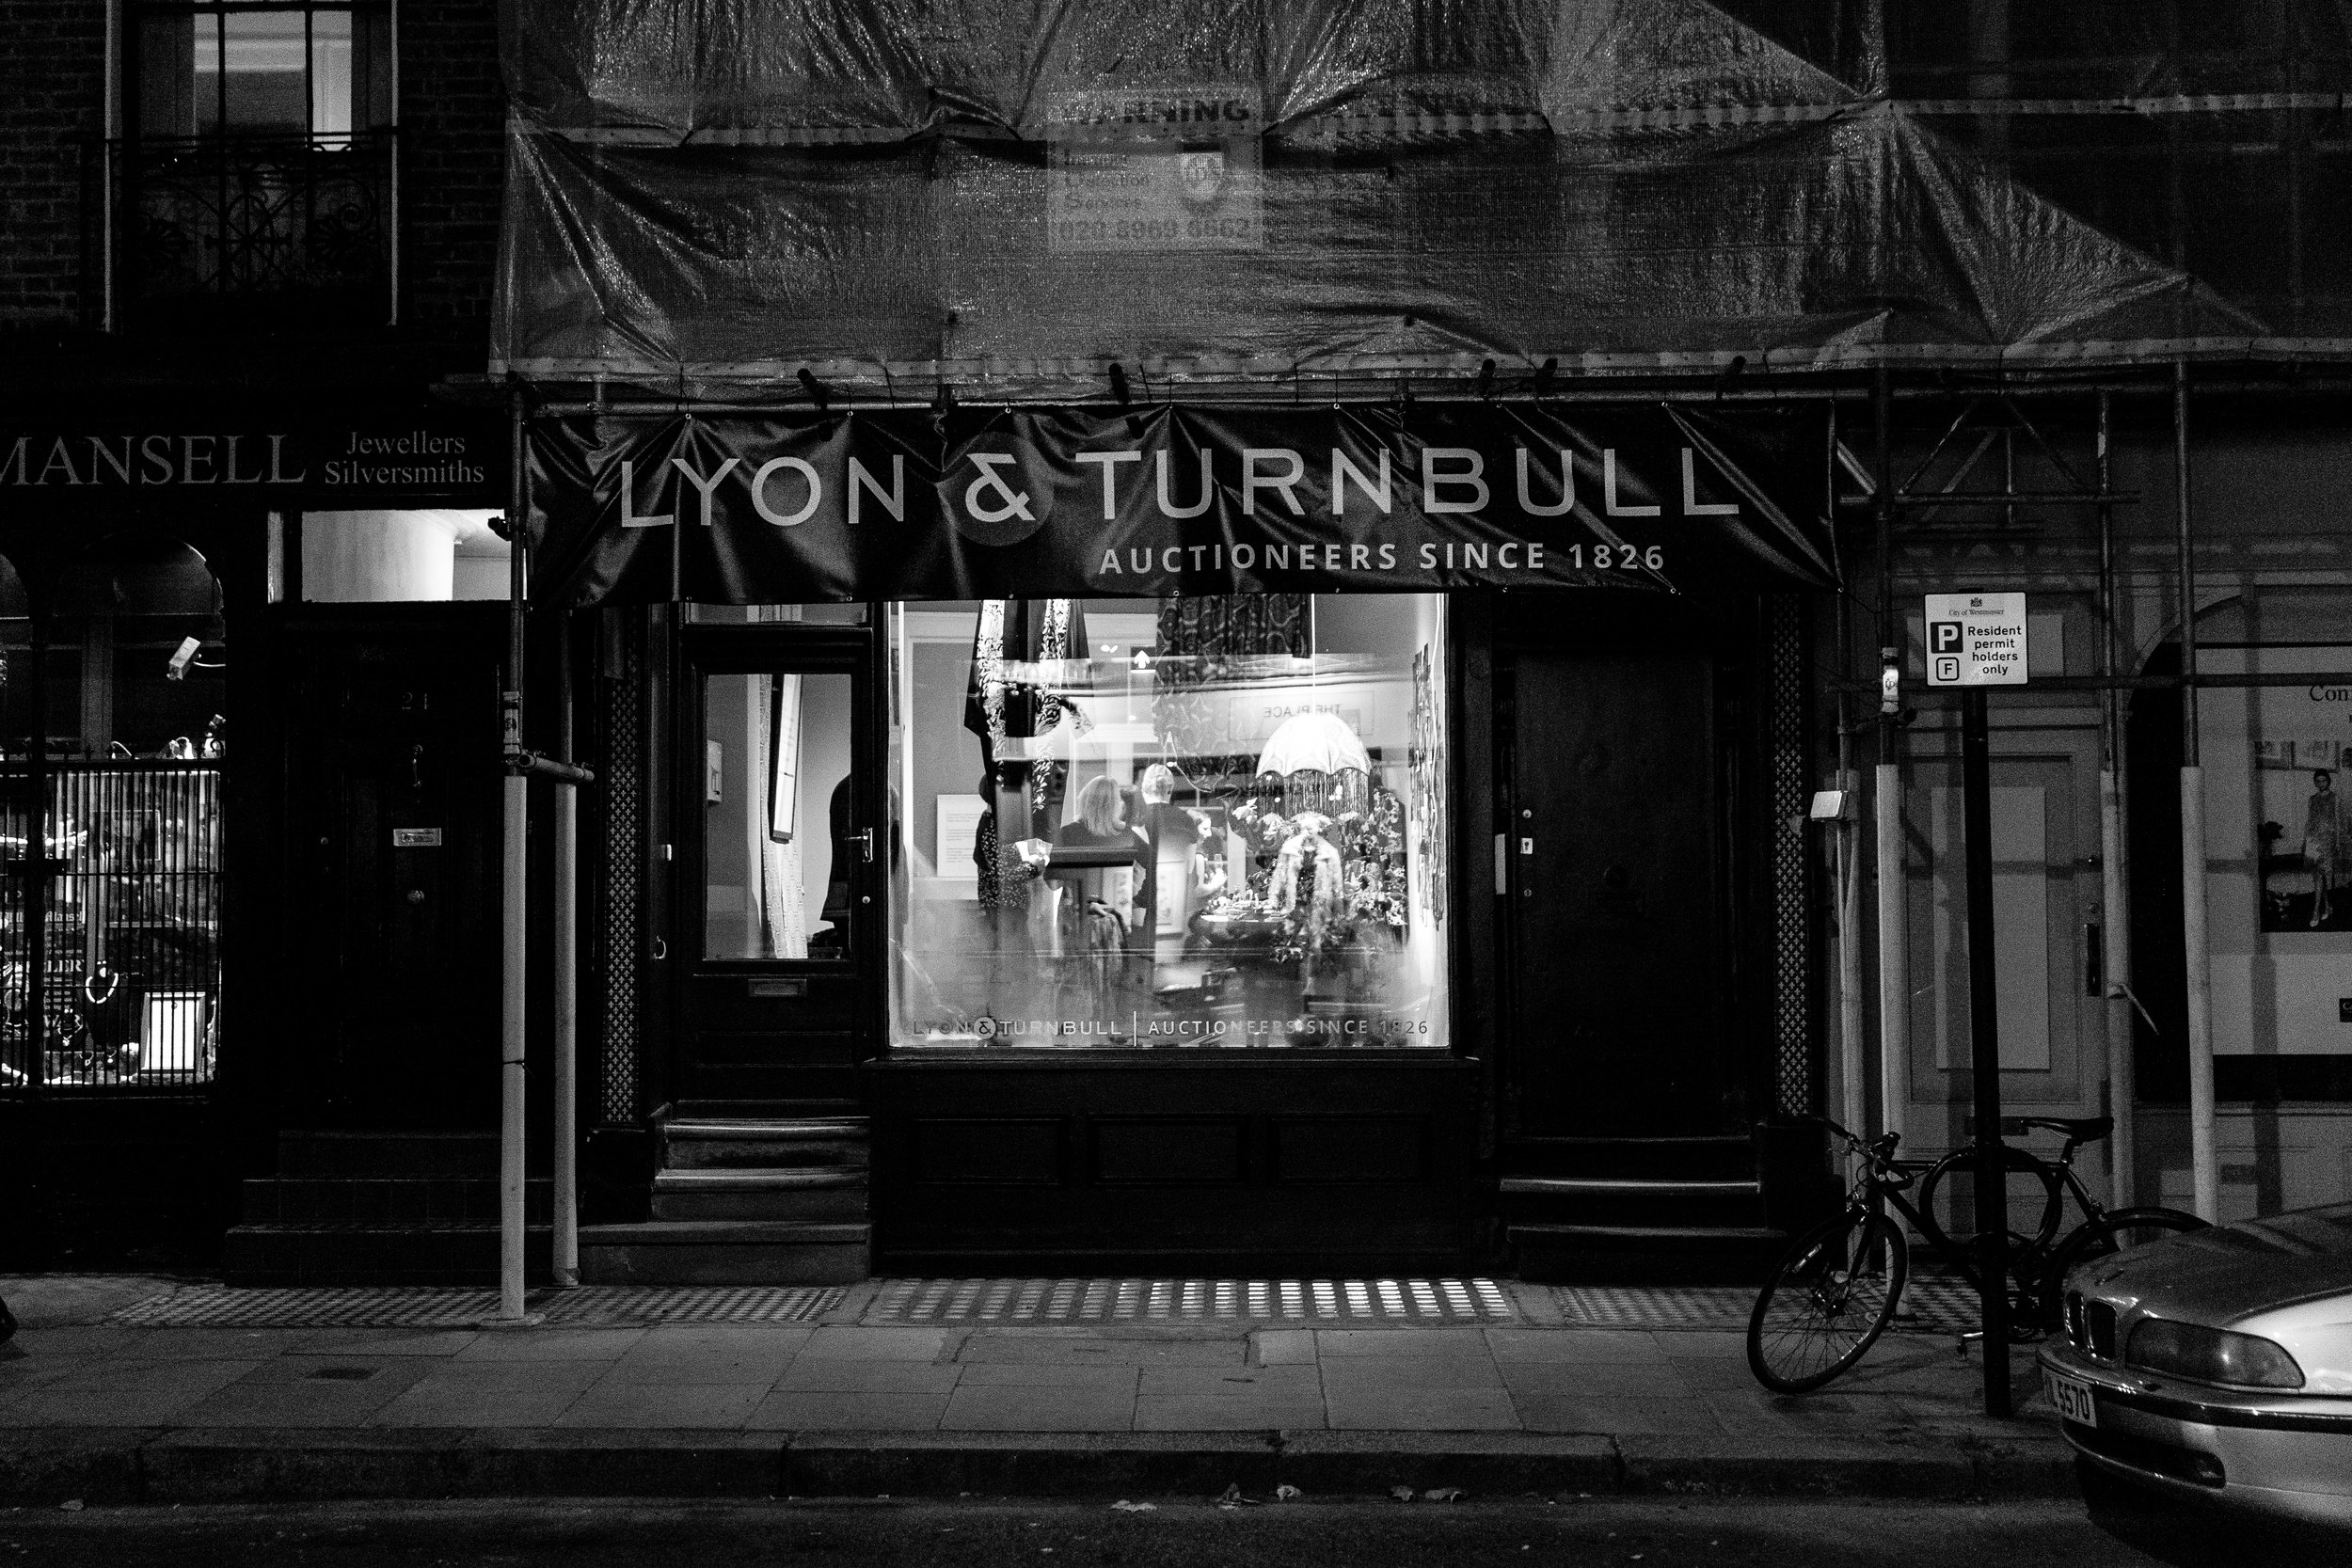 001_Lyon_Turnbull_PressEvent.jpg